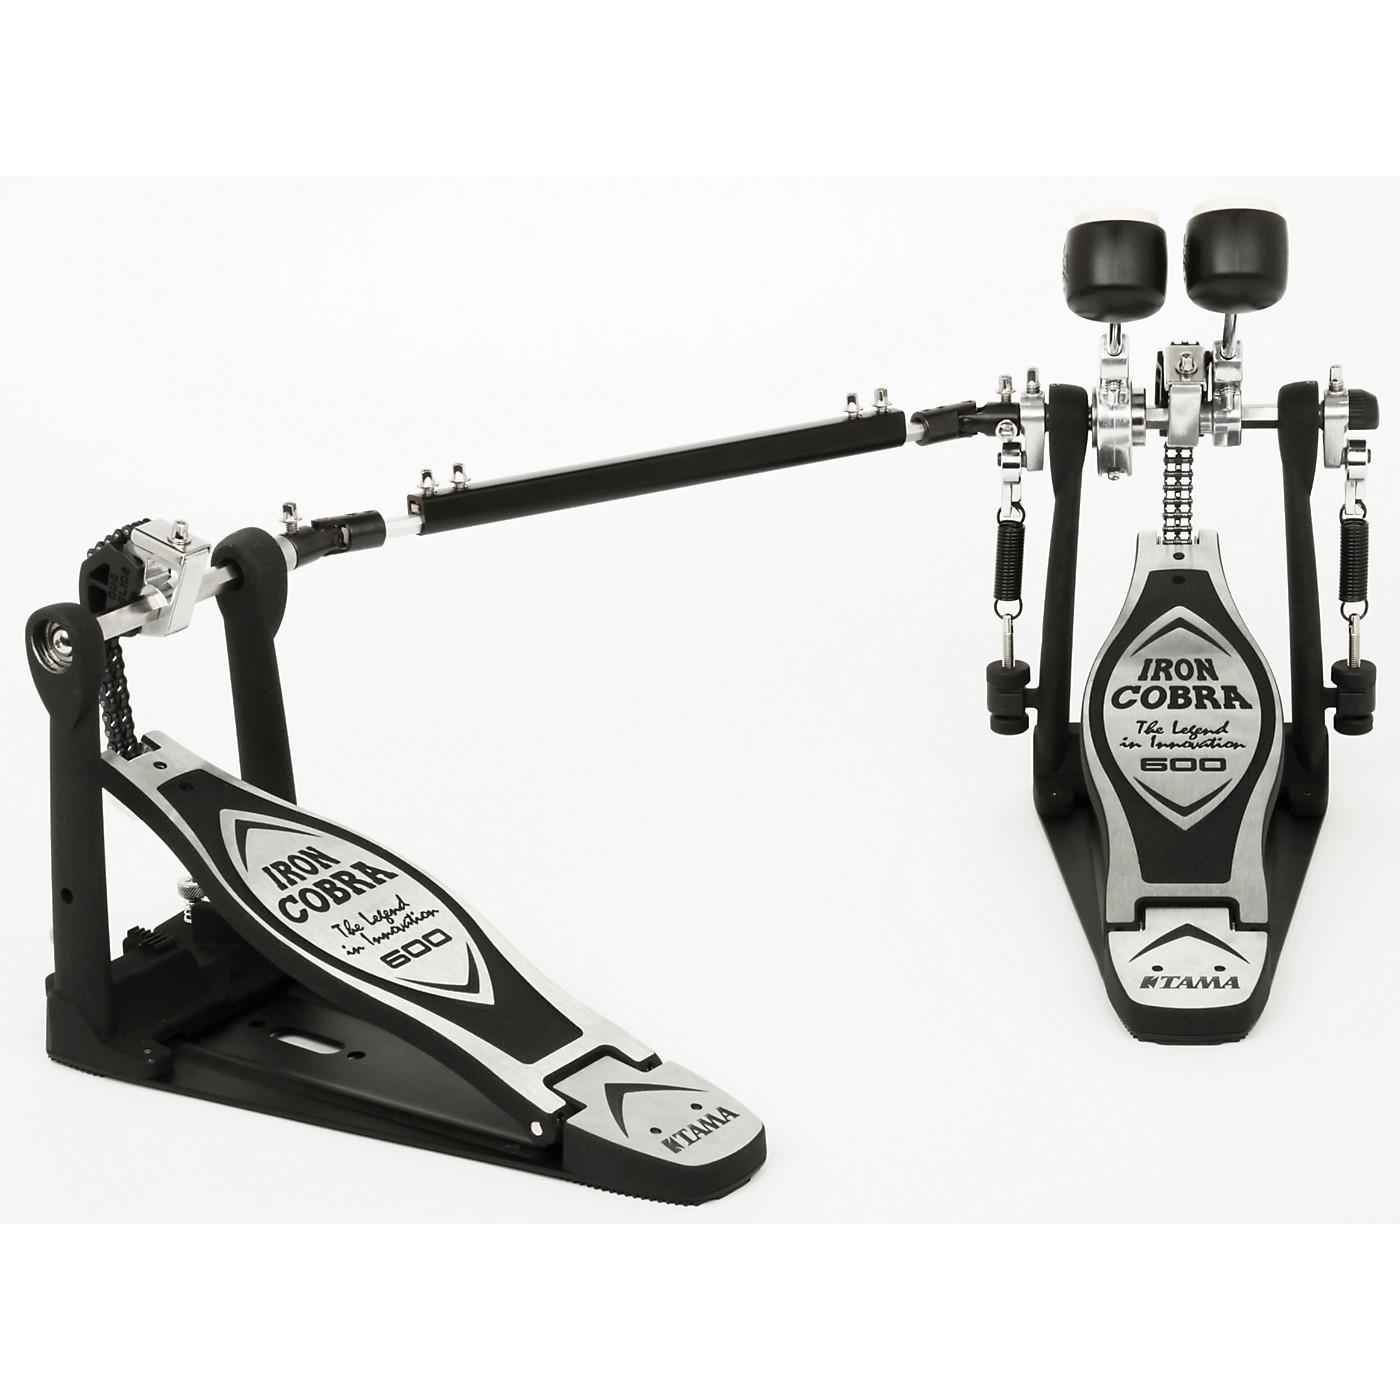 TAMA Iron Cobra 600 Series Double Bass Drum Pedal thumbnail